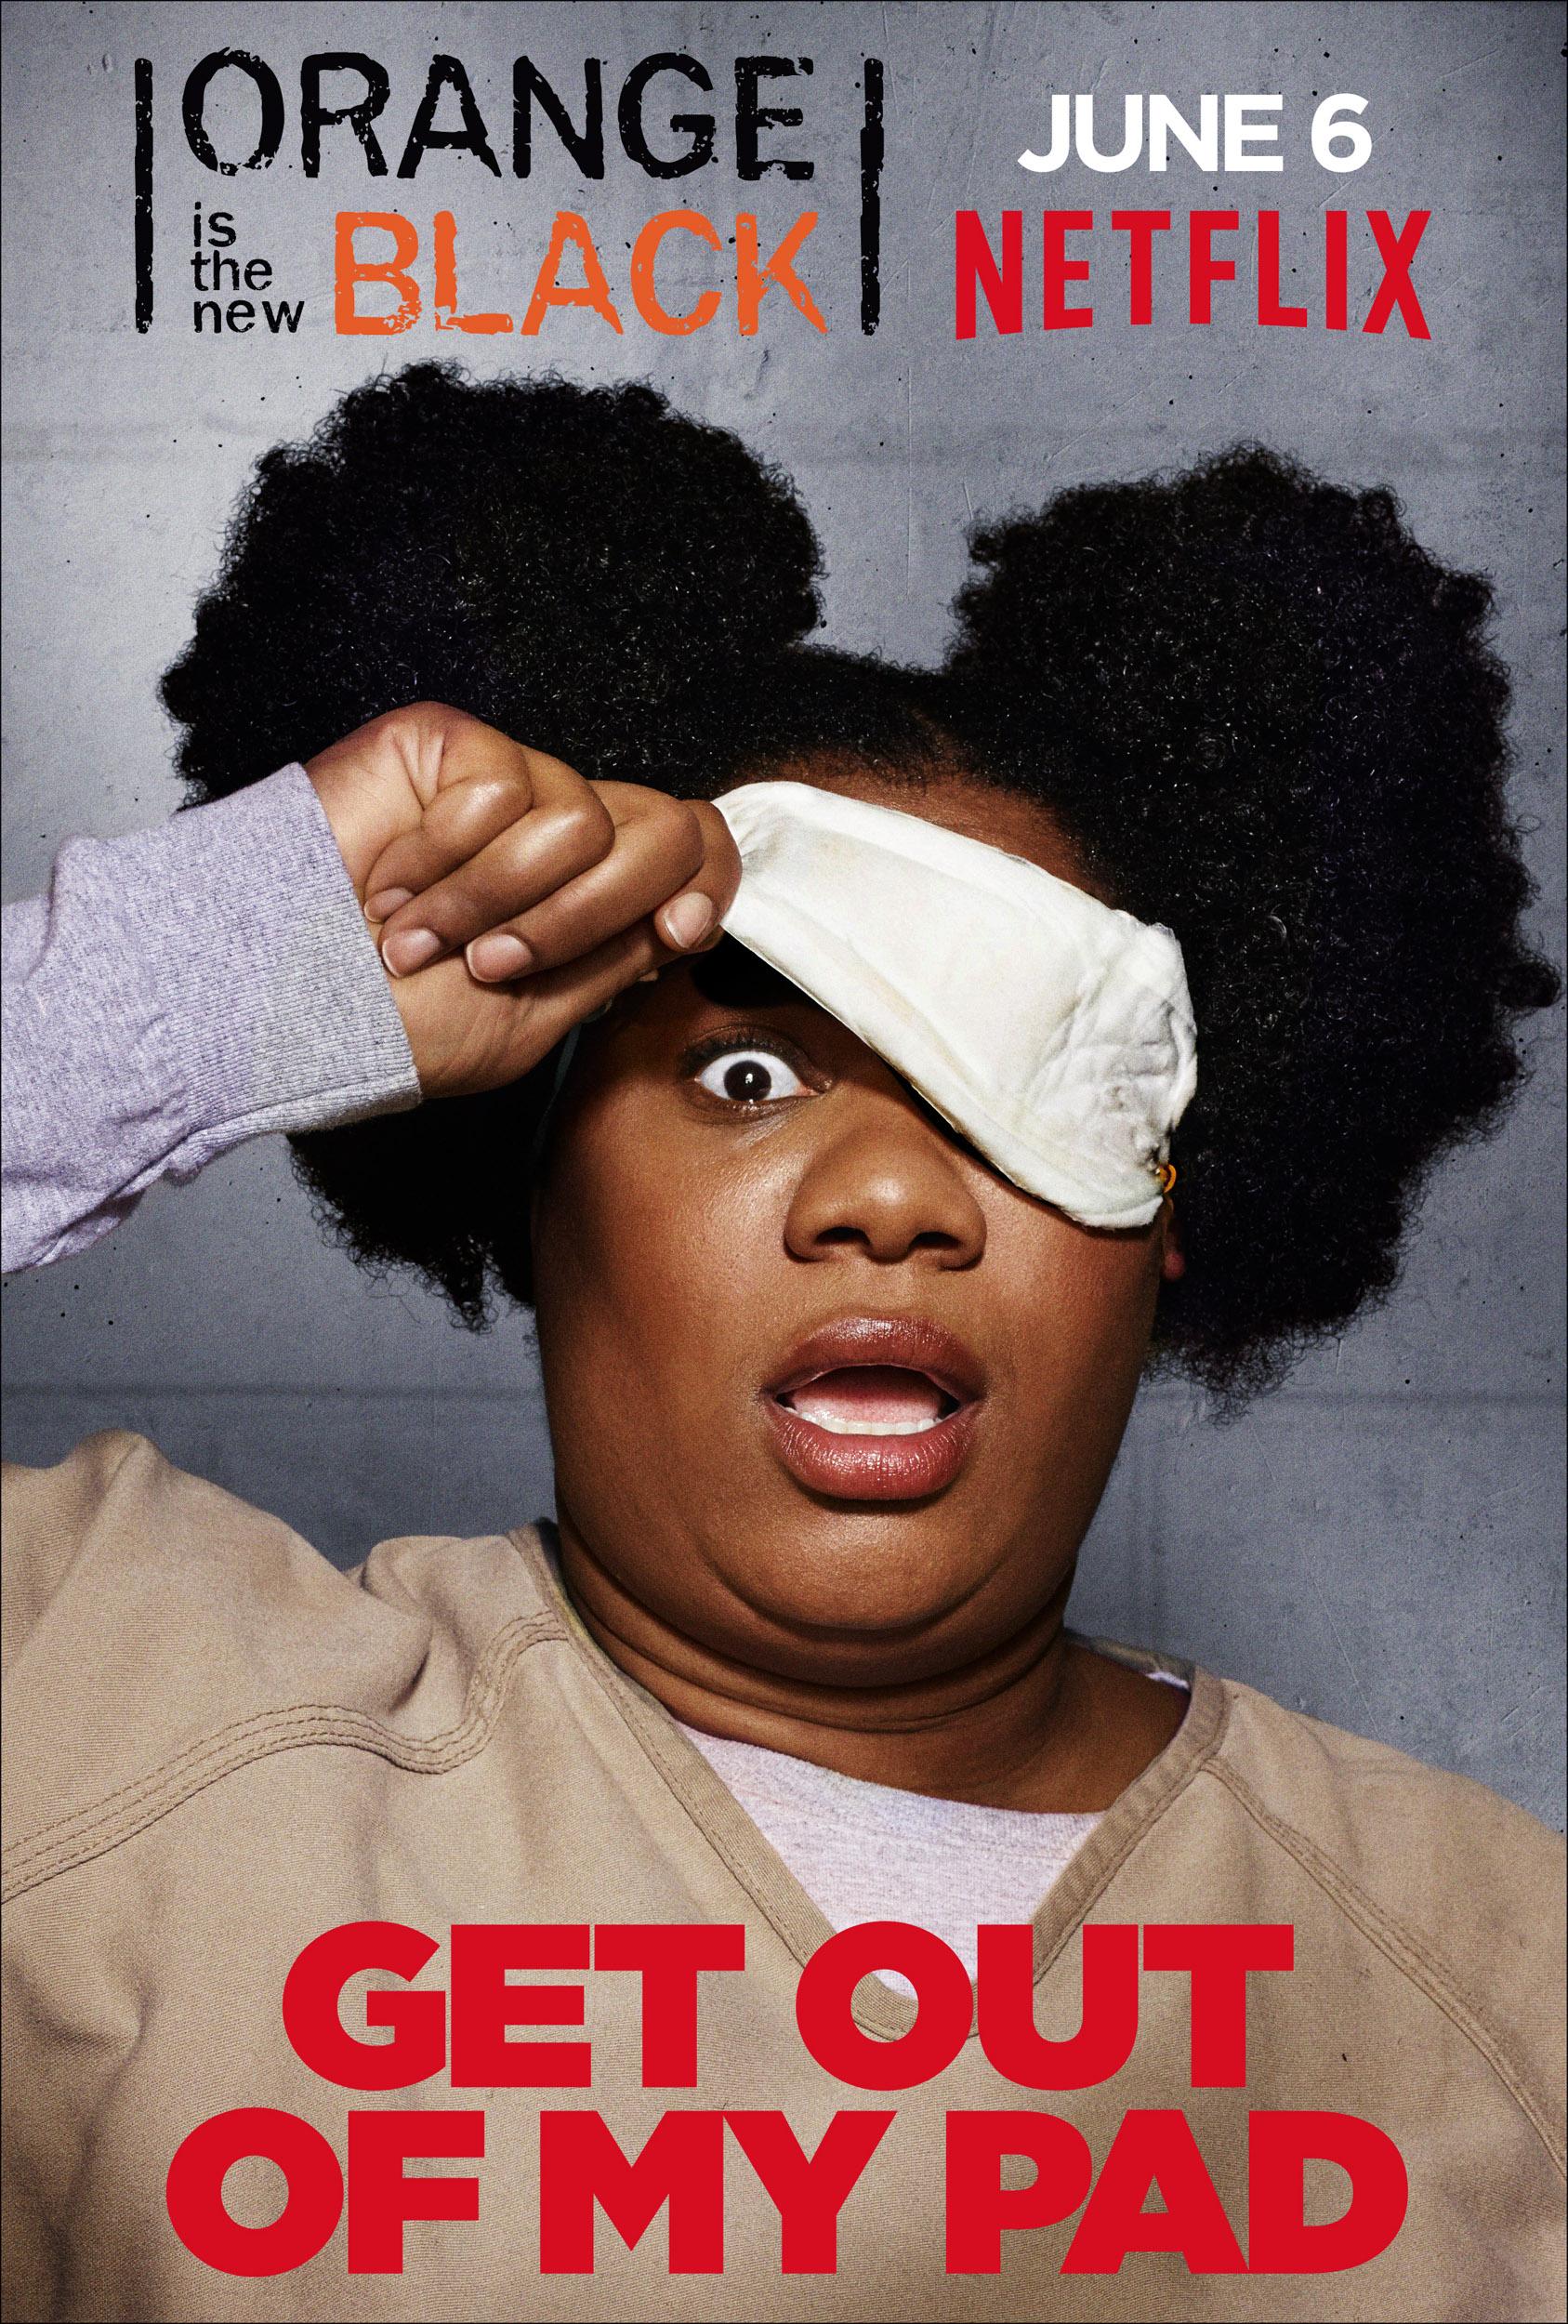 Orange Is the New Black - Adrienne C. Moore (Cindy Hayes)